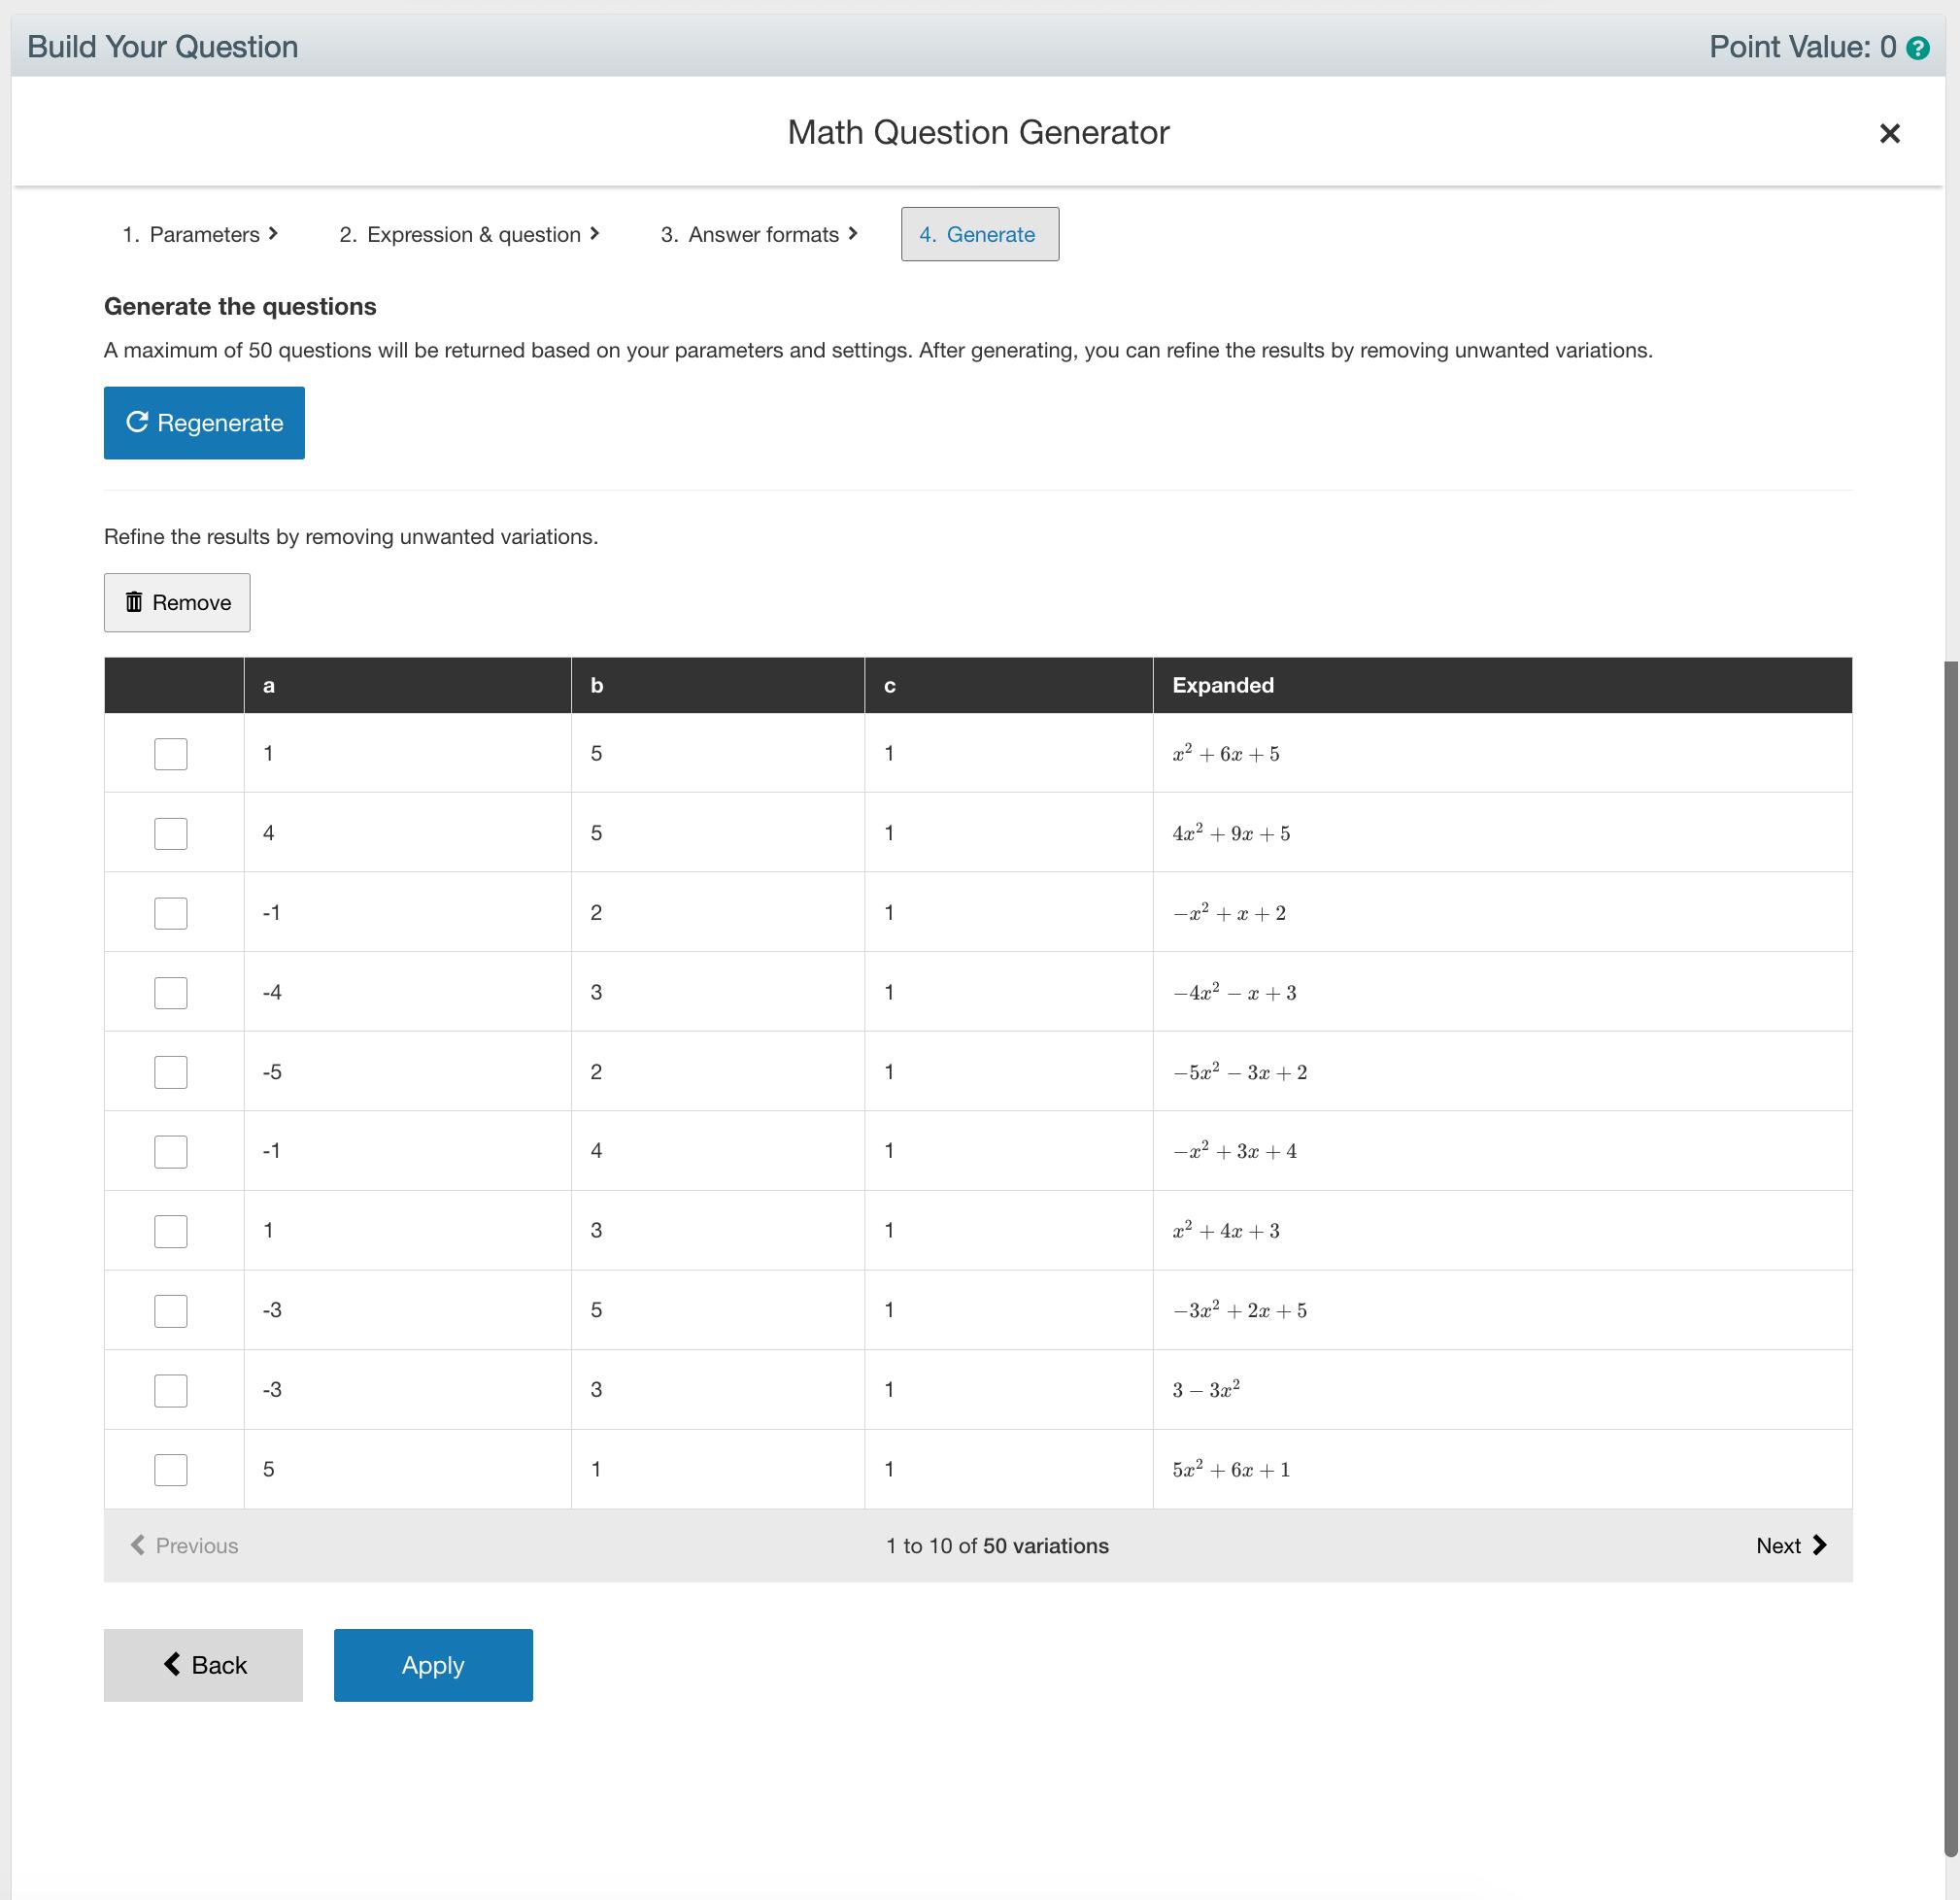 Math Question Generator Step 4